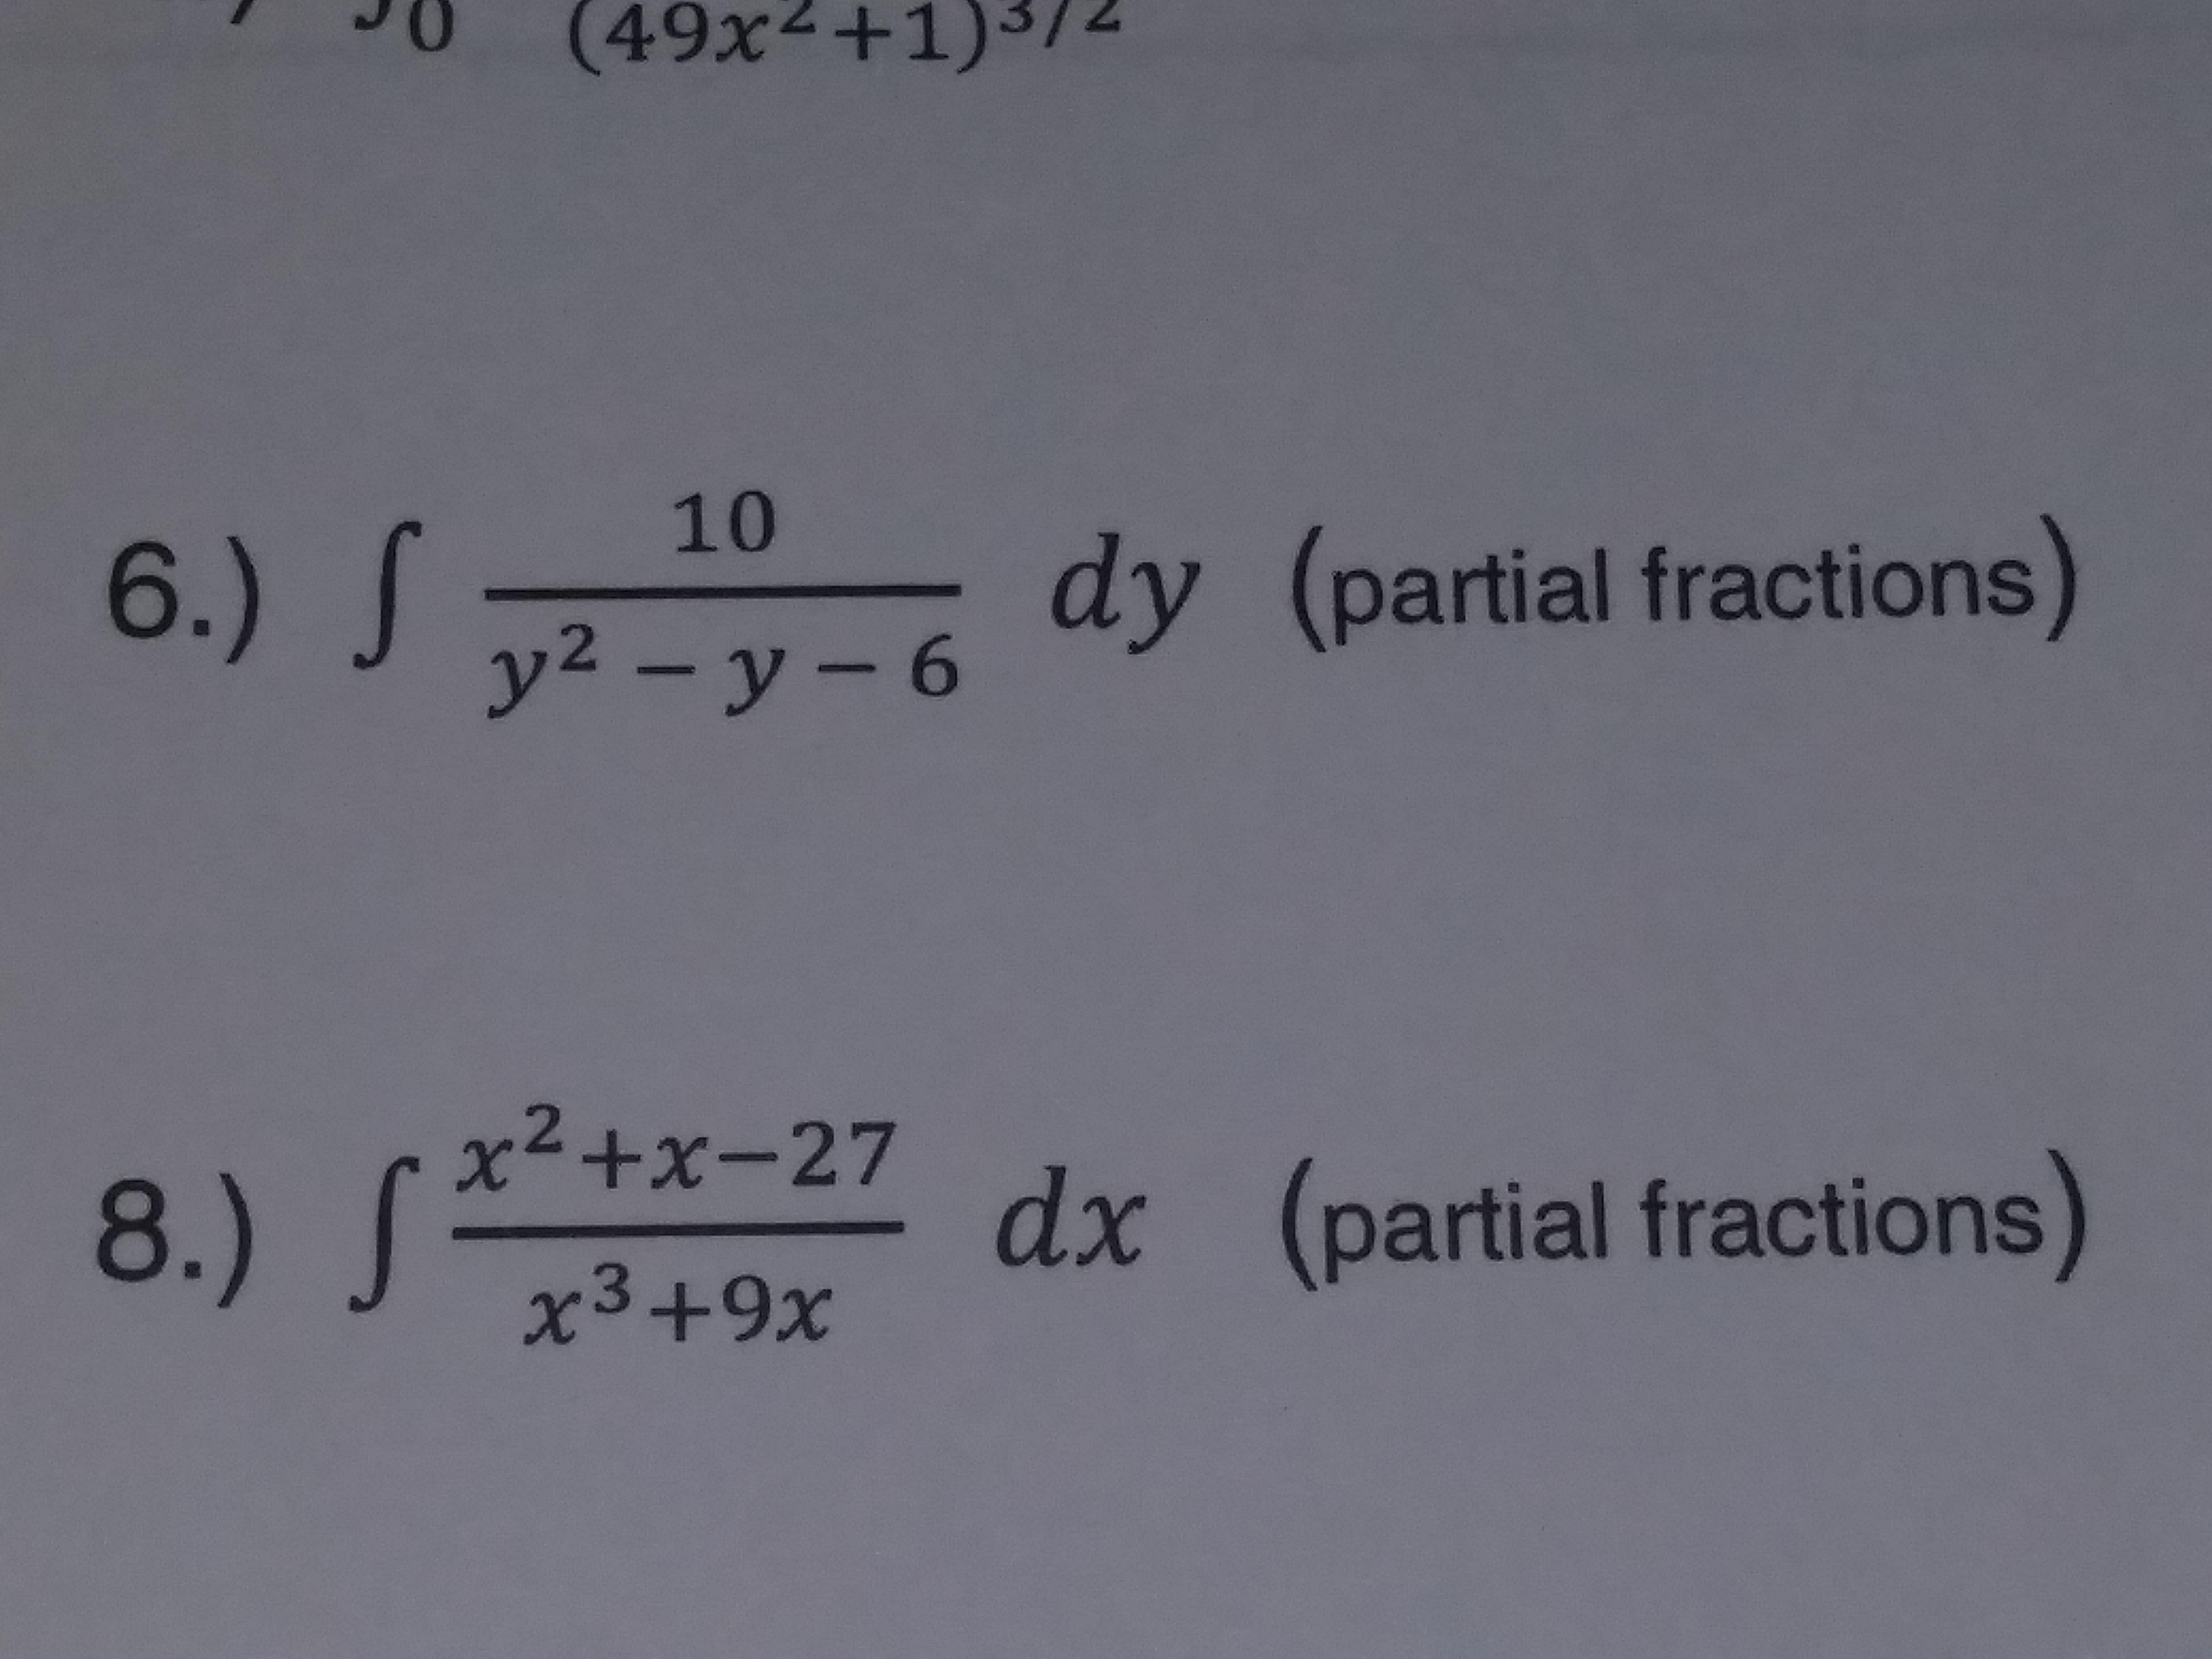 0 (49x +1)74 10 6 y (partial fractions x2 +x-27 dx (partial fractions)